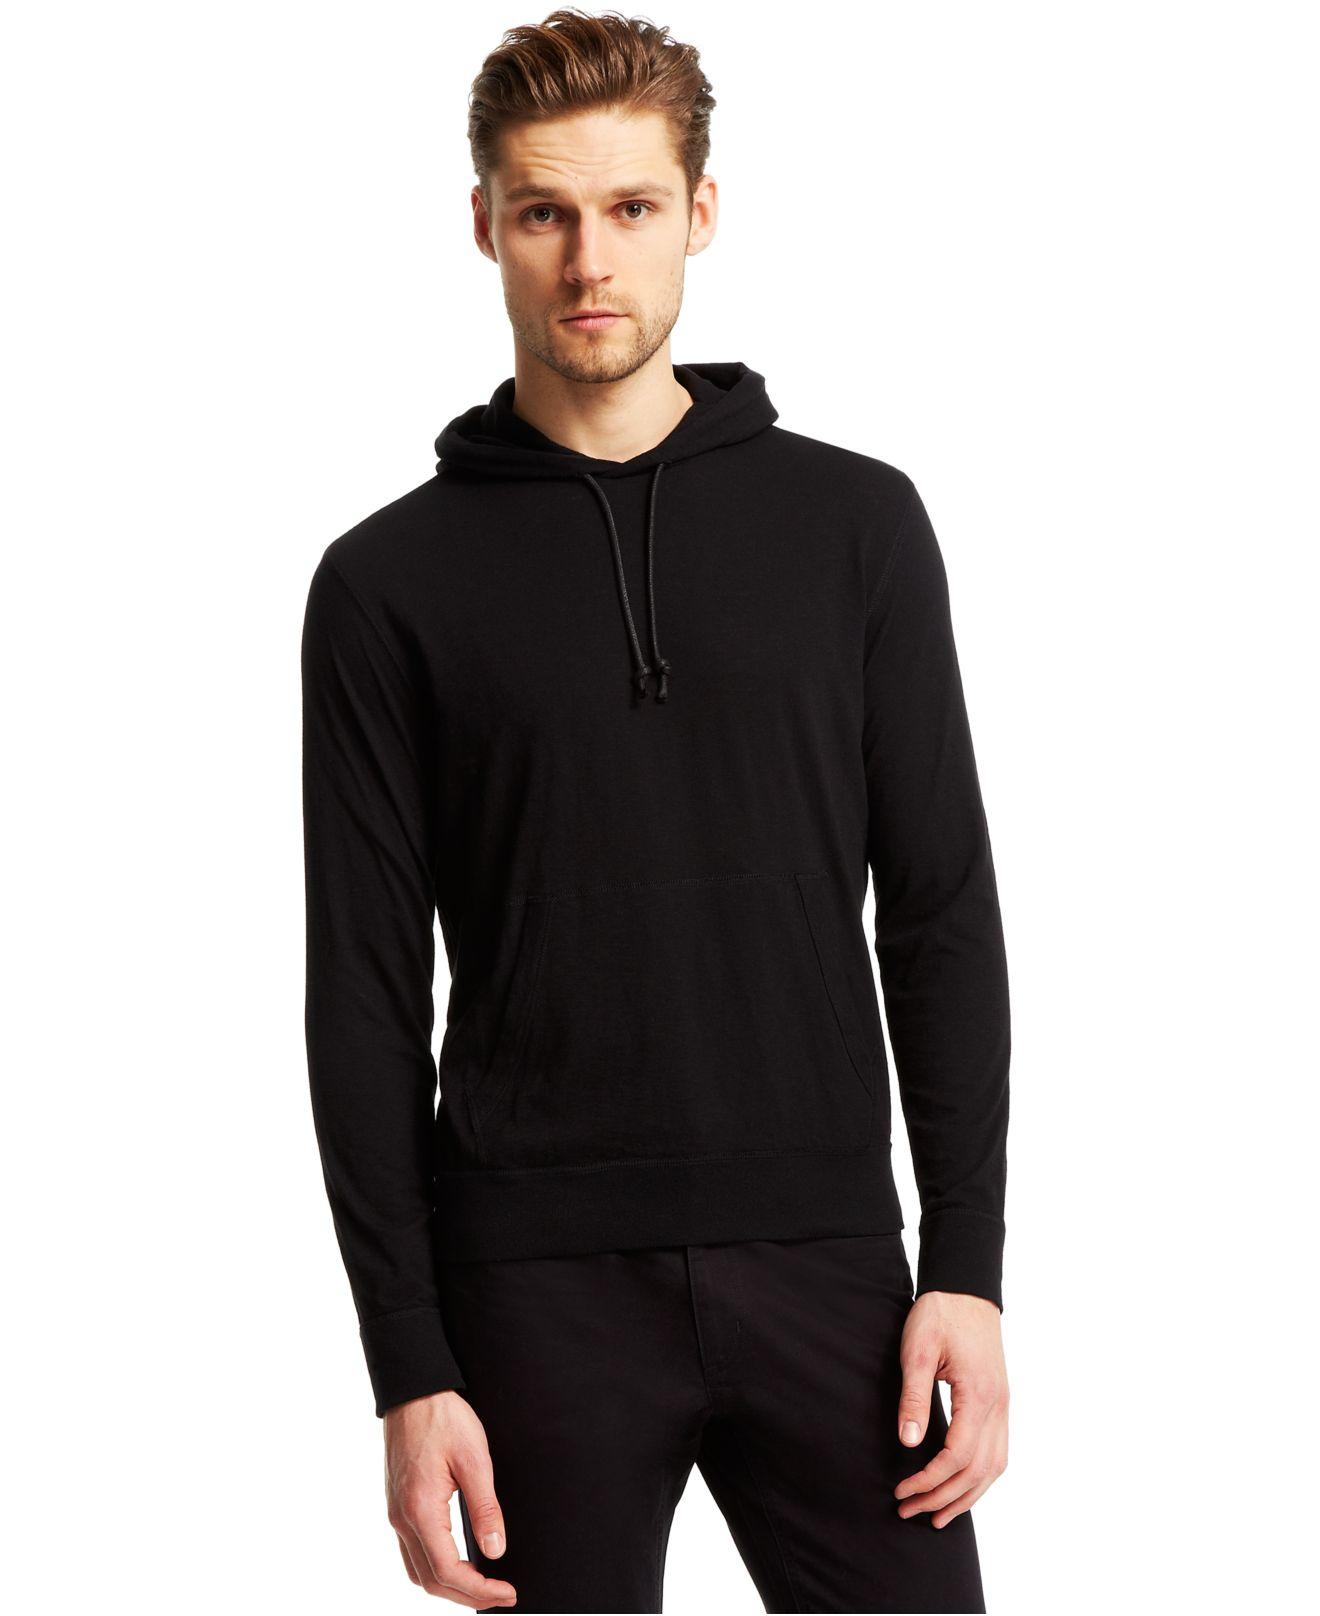 Black t shirt hoodie - Black T Shirt Hoodie